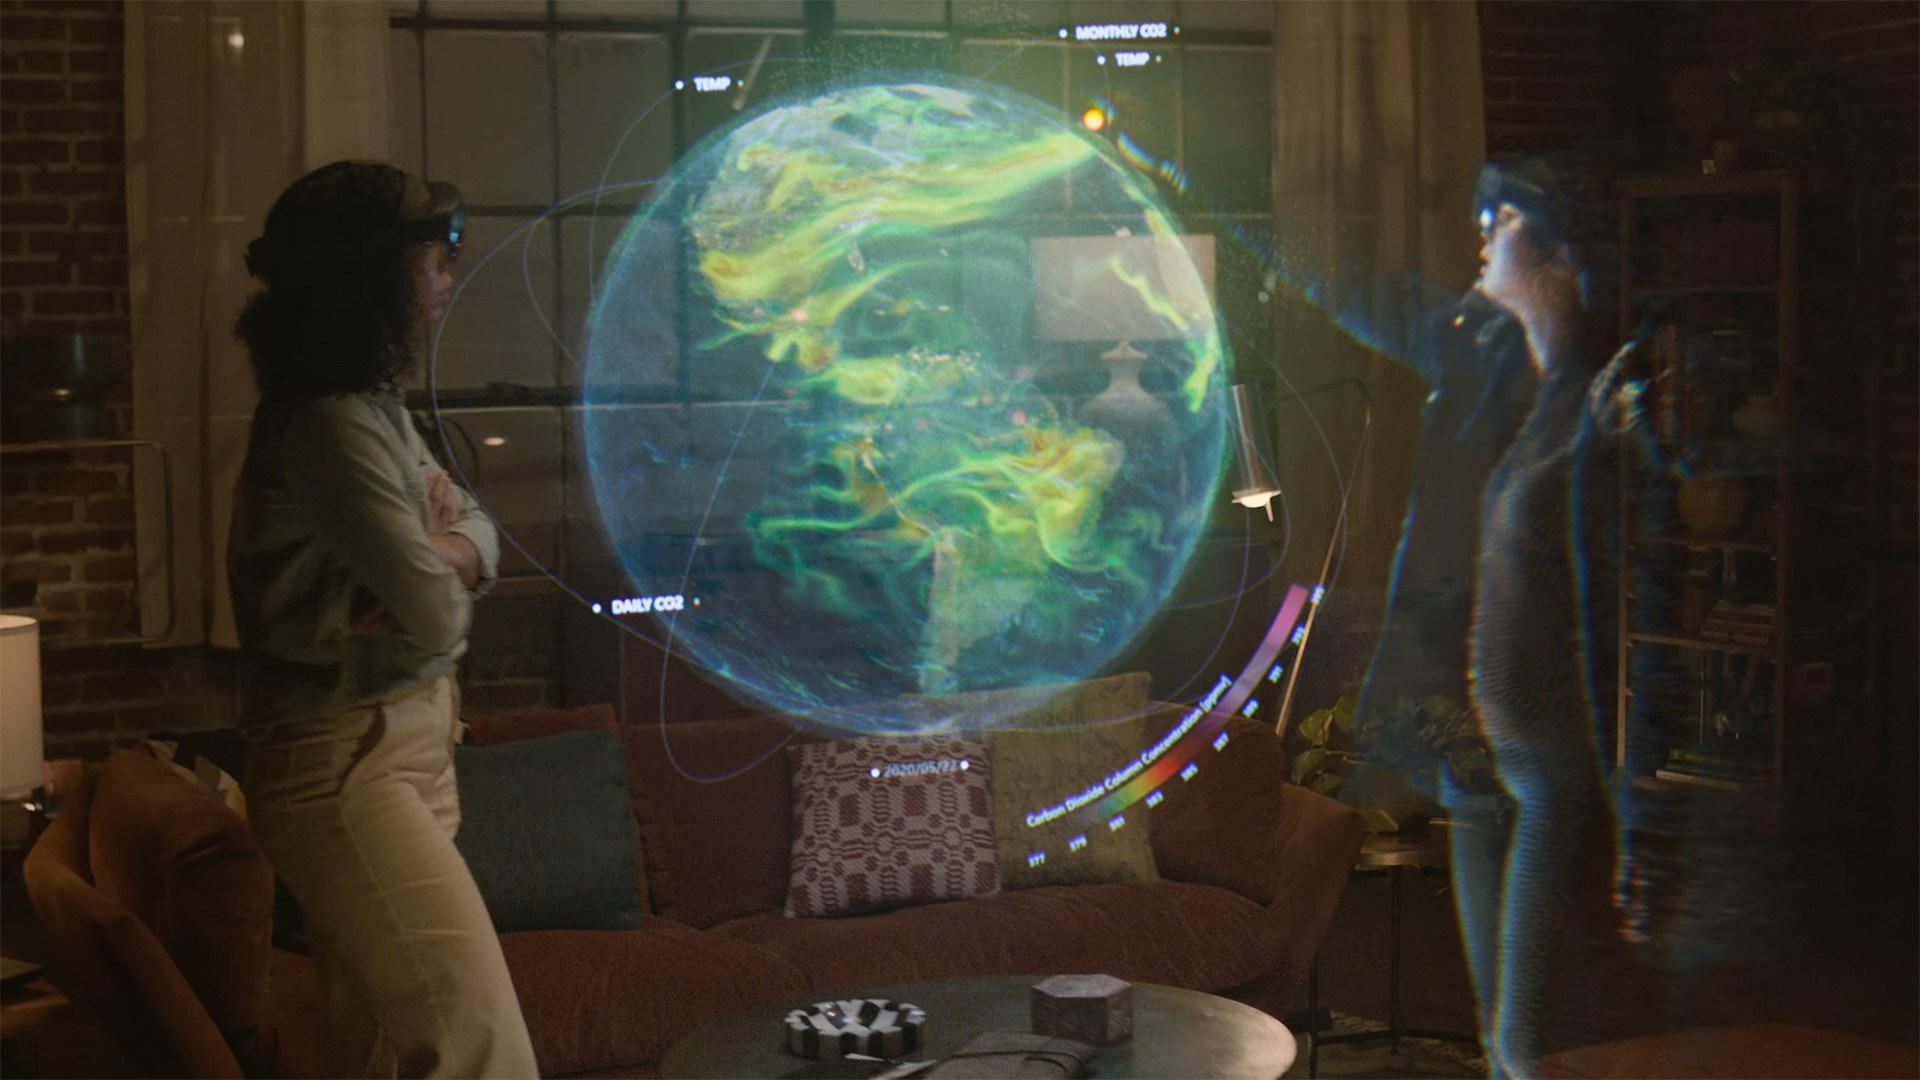 Microsoft, Virtual Reality, VR, Augmented Reality, Headset, HoloLens, Mesh, AR, Microsoft Teams, Mixed Reality, Hologramm, Dynamics 365, Microsoft Ignite 2021